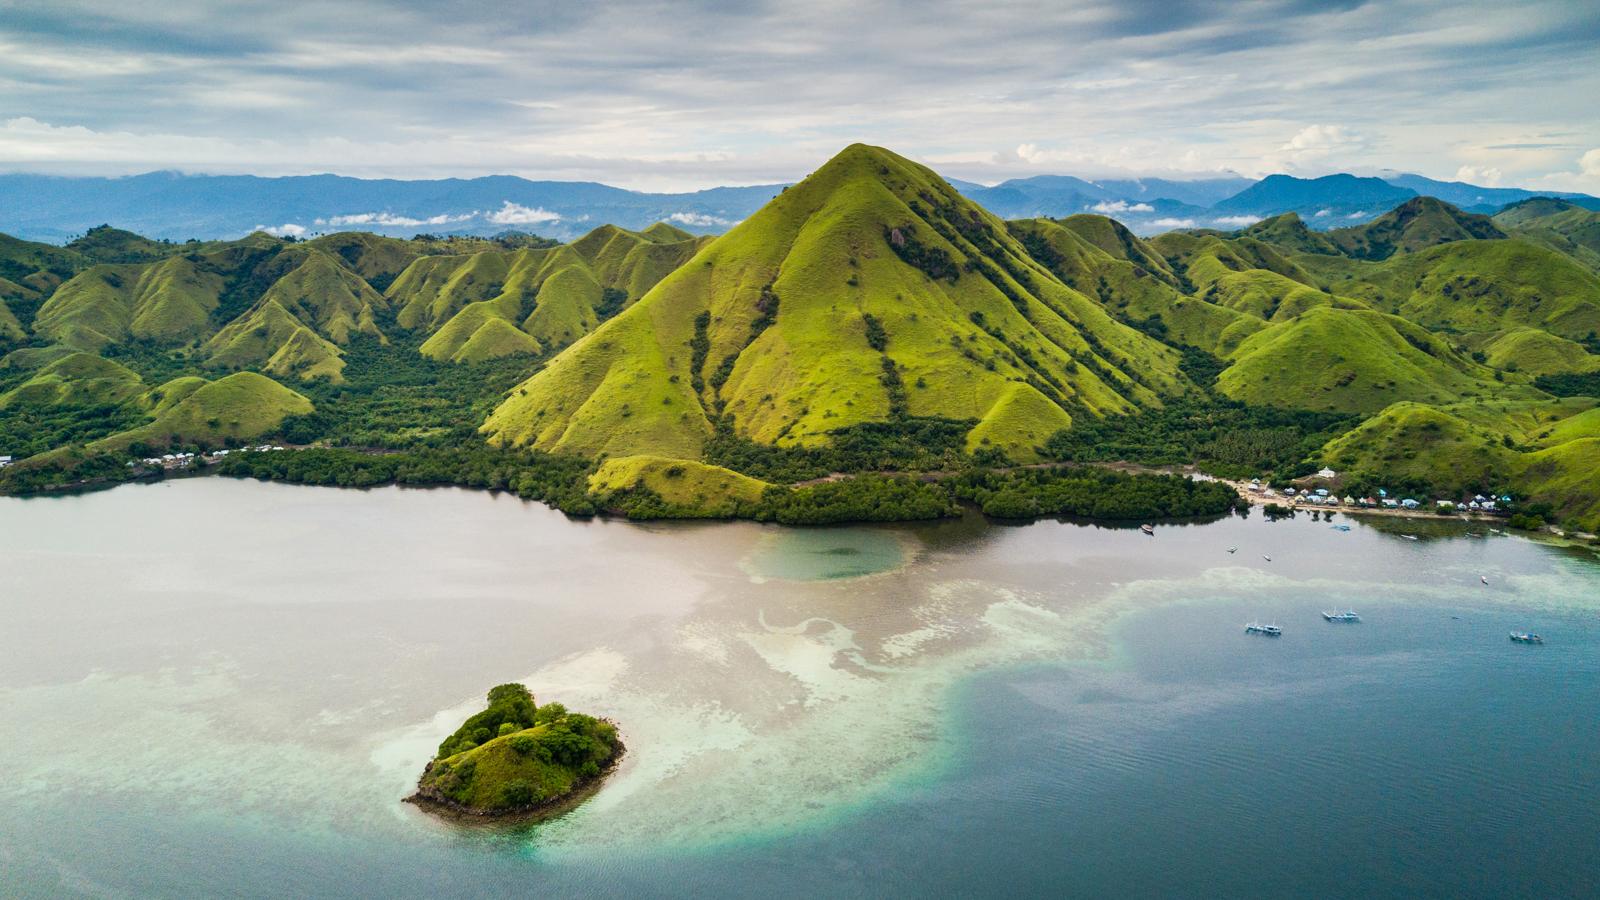 Komodo Island view drone suwandi Changra Photography.jpg